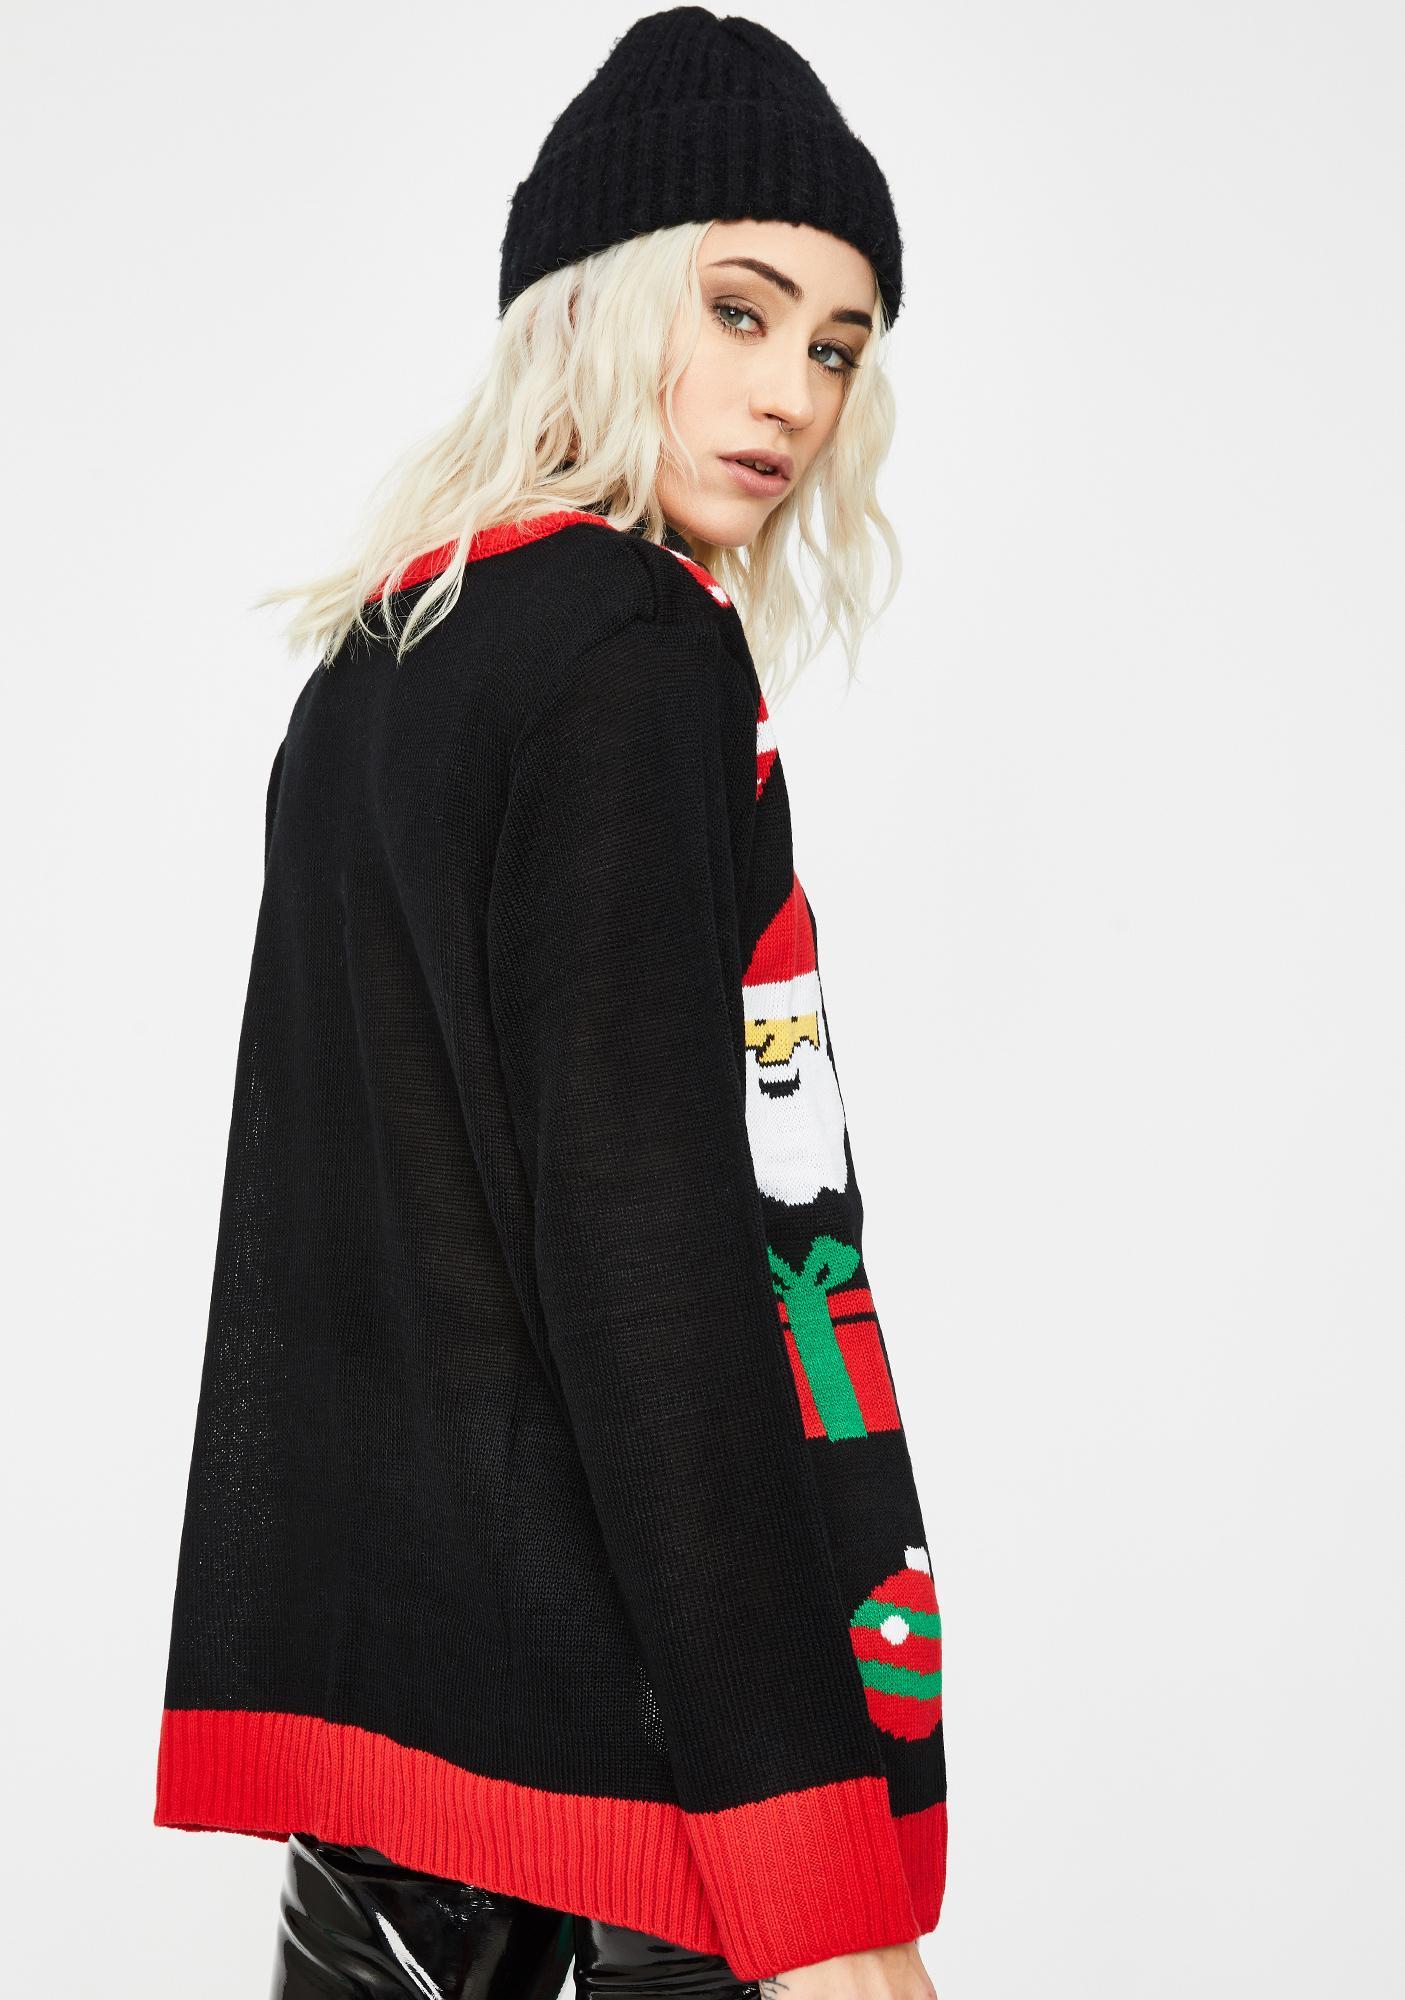 Wonderful Year Holiday Sweater